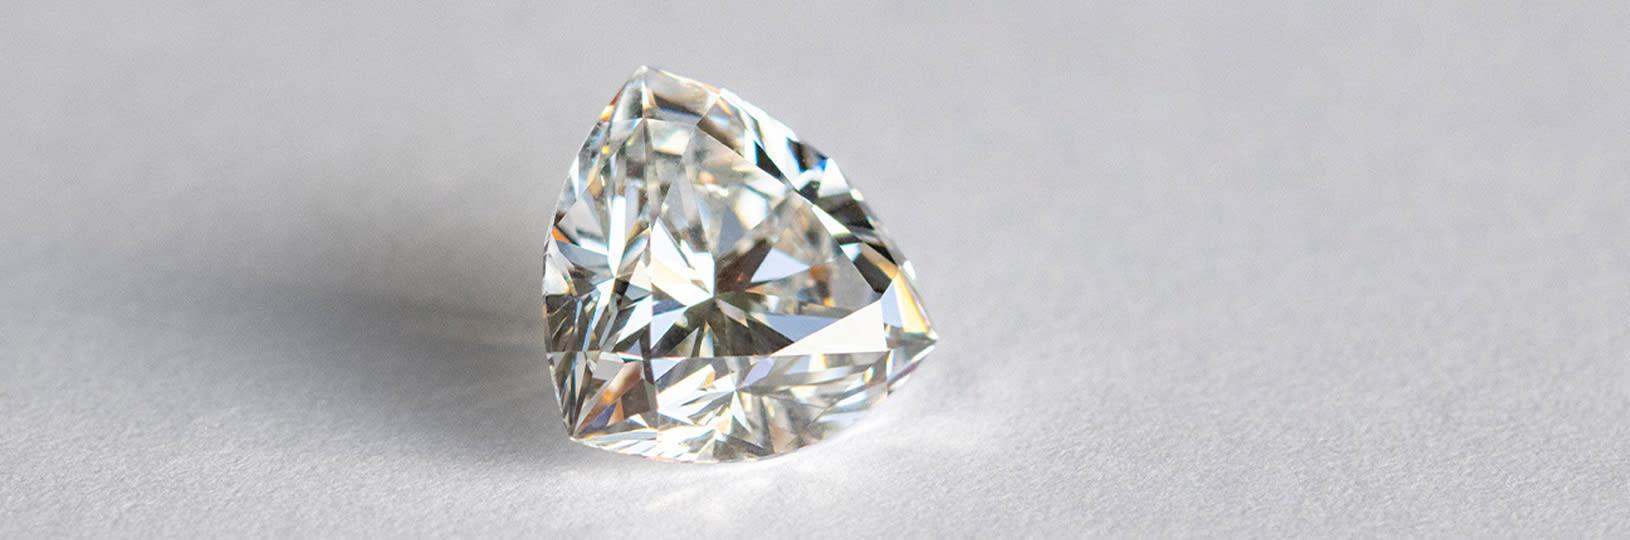 A closeup image of a lab grown diamond